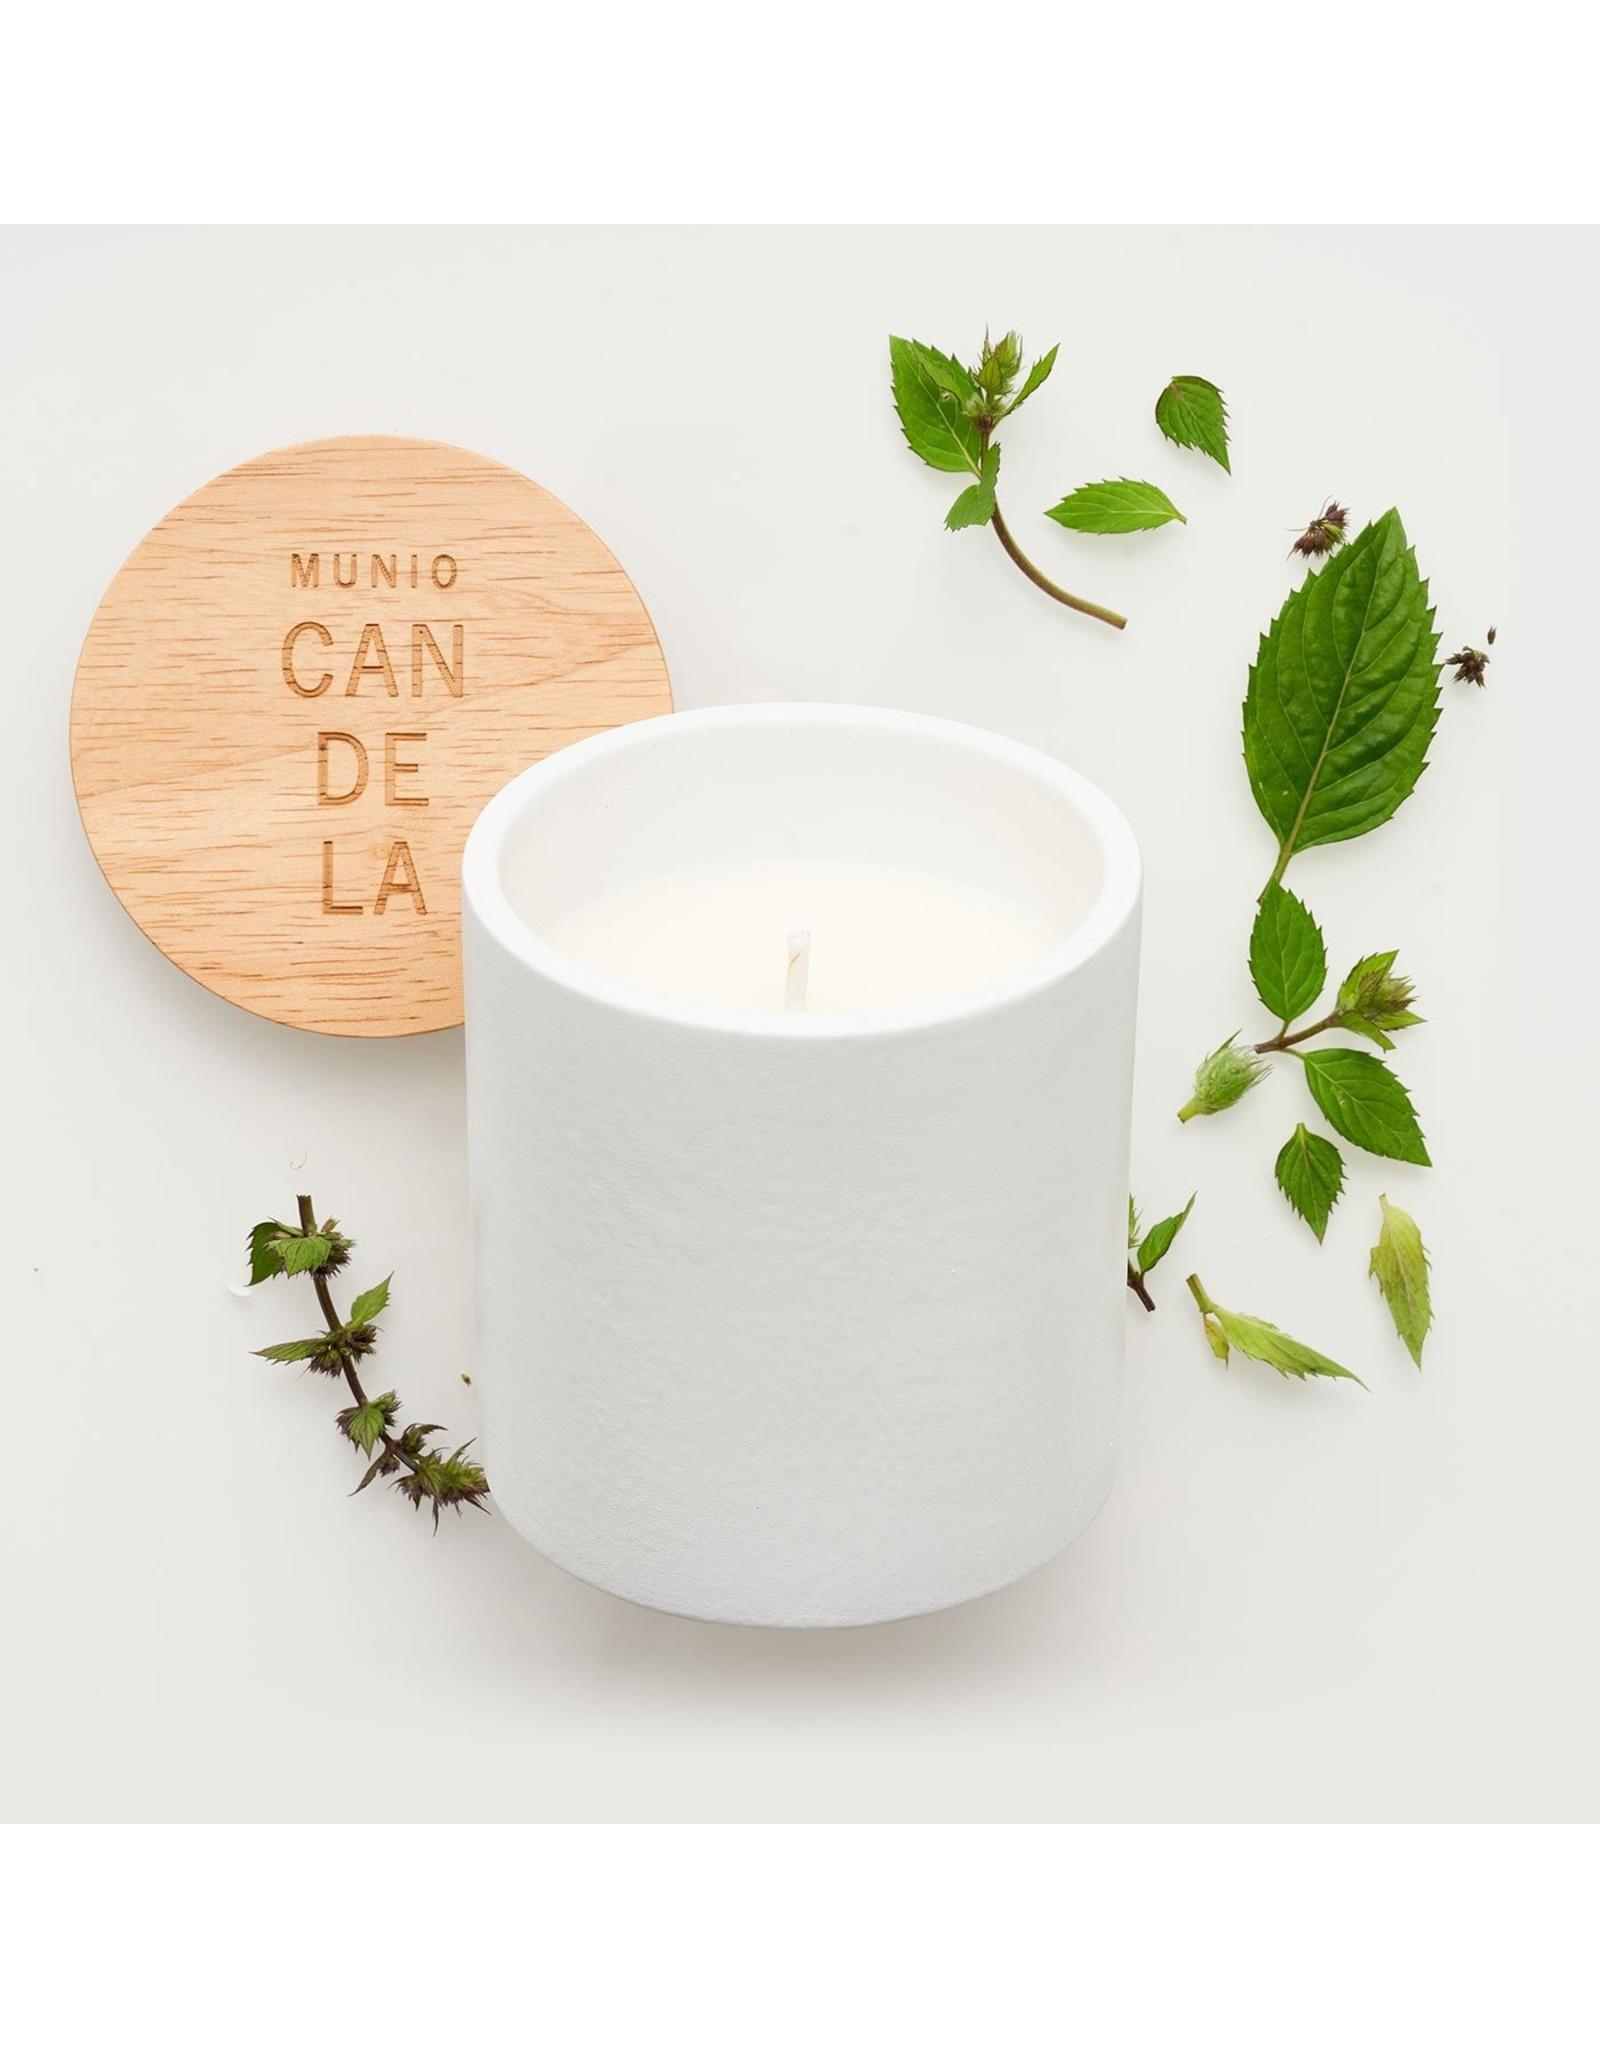 Munio Candela White ceramic votive with peppermint fragrance 300ml